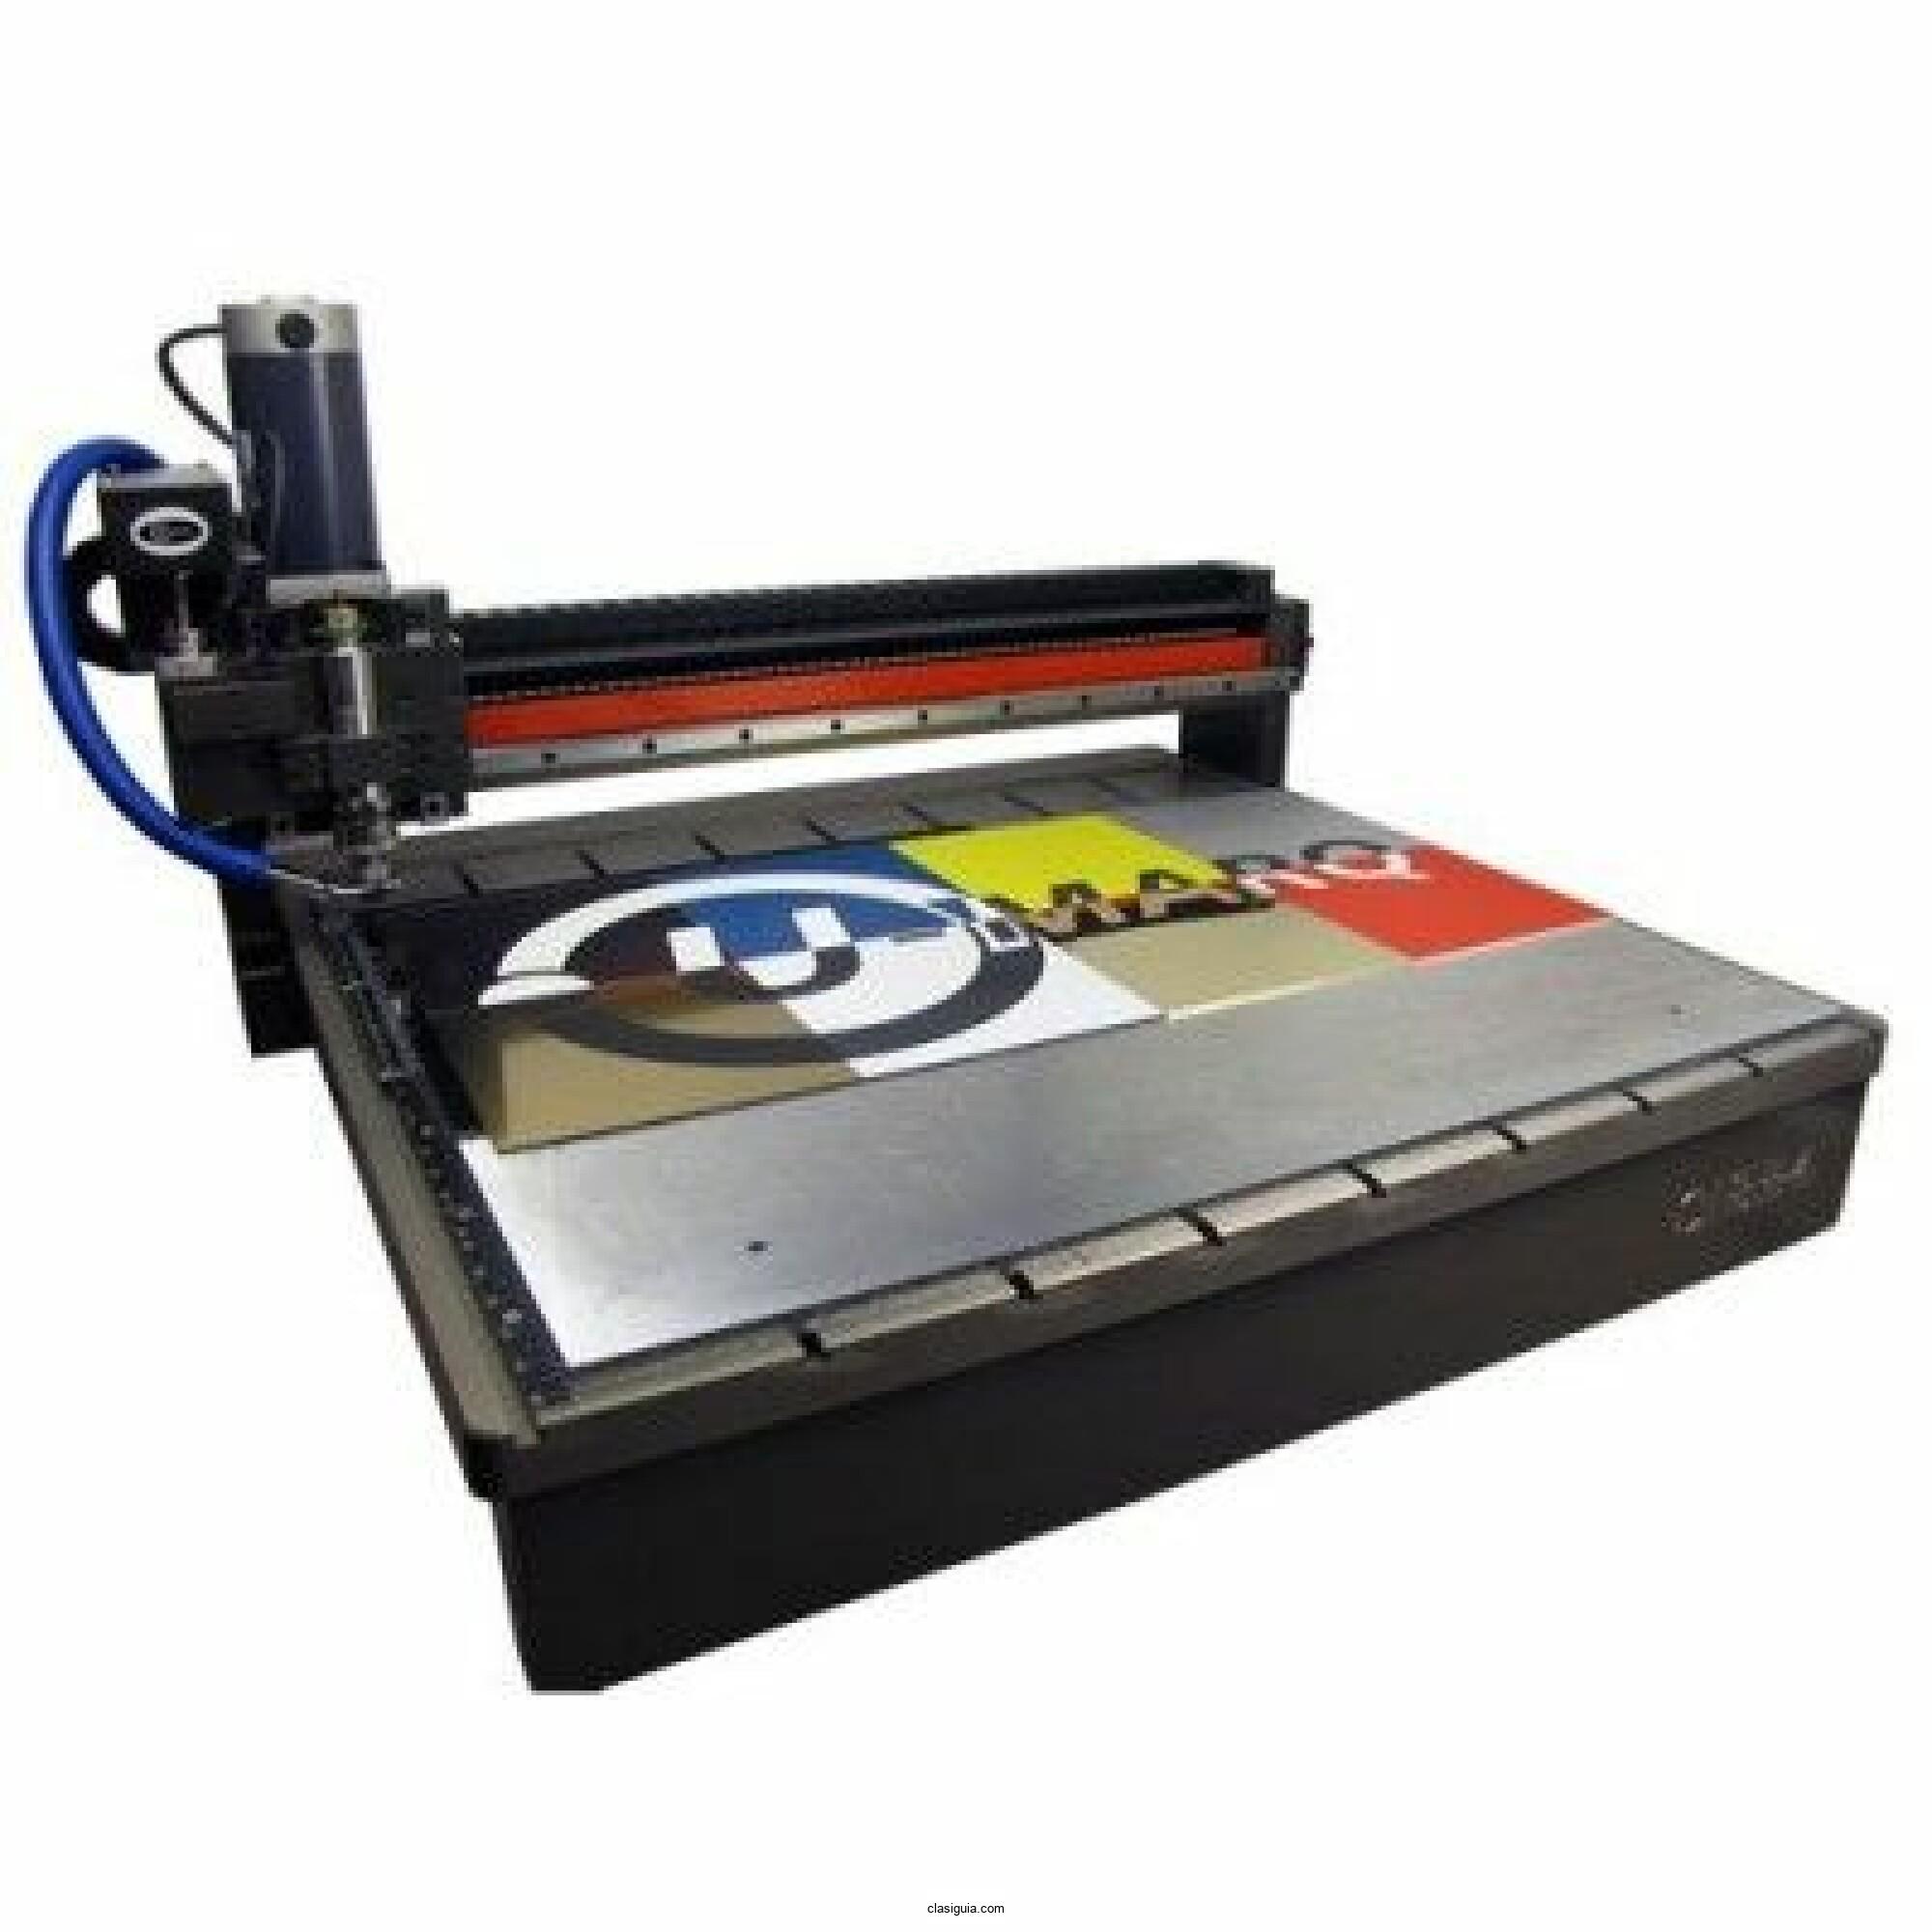 U-Marq Quest 1824 Heavy Duty Engraving Machine (MITRA PRINT)